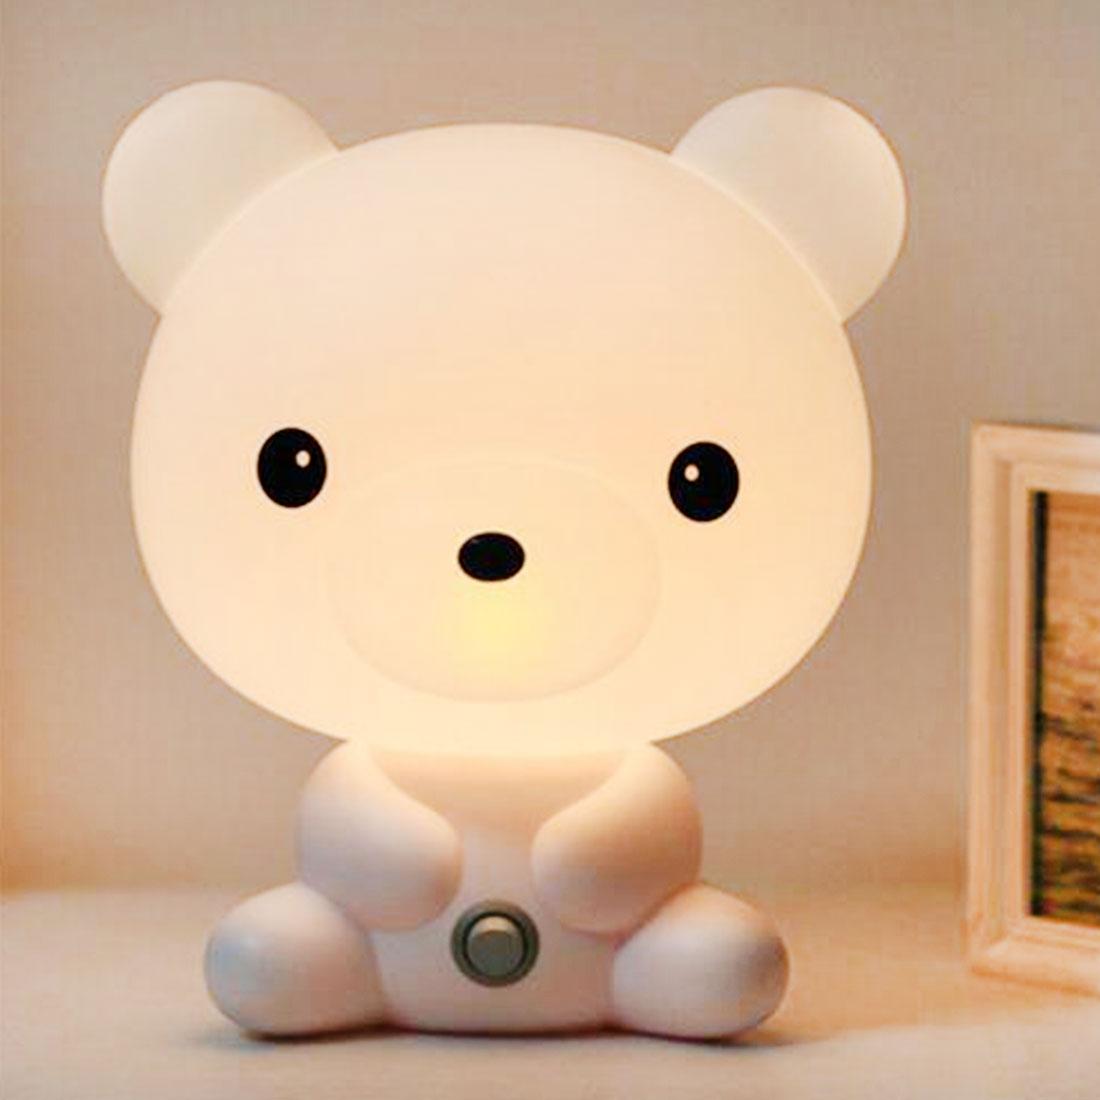 EU Plug Baby Bedroom Lamps Night Light Cartoon Pets Rabbit Panda PVC Plastic Sleep Led Kid Lamp Bulb Nightlight for Children